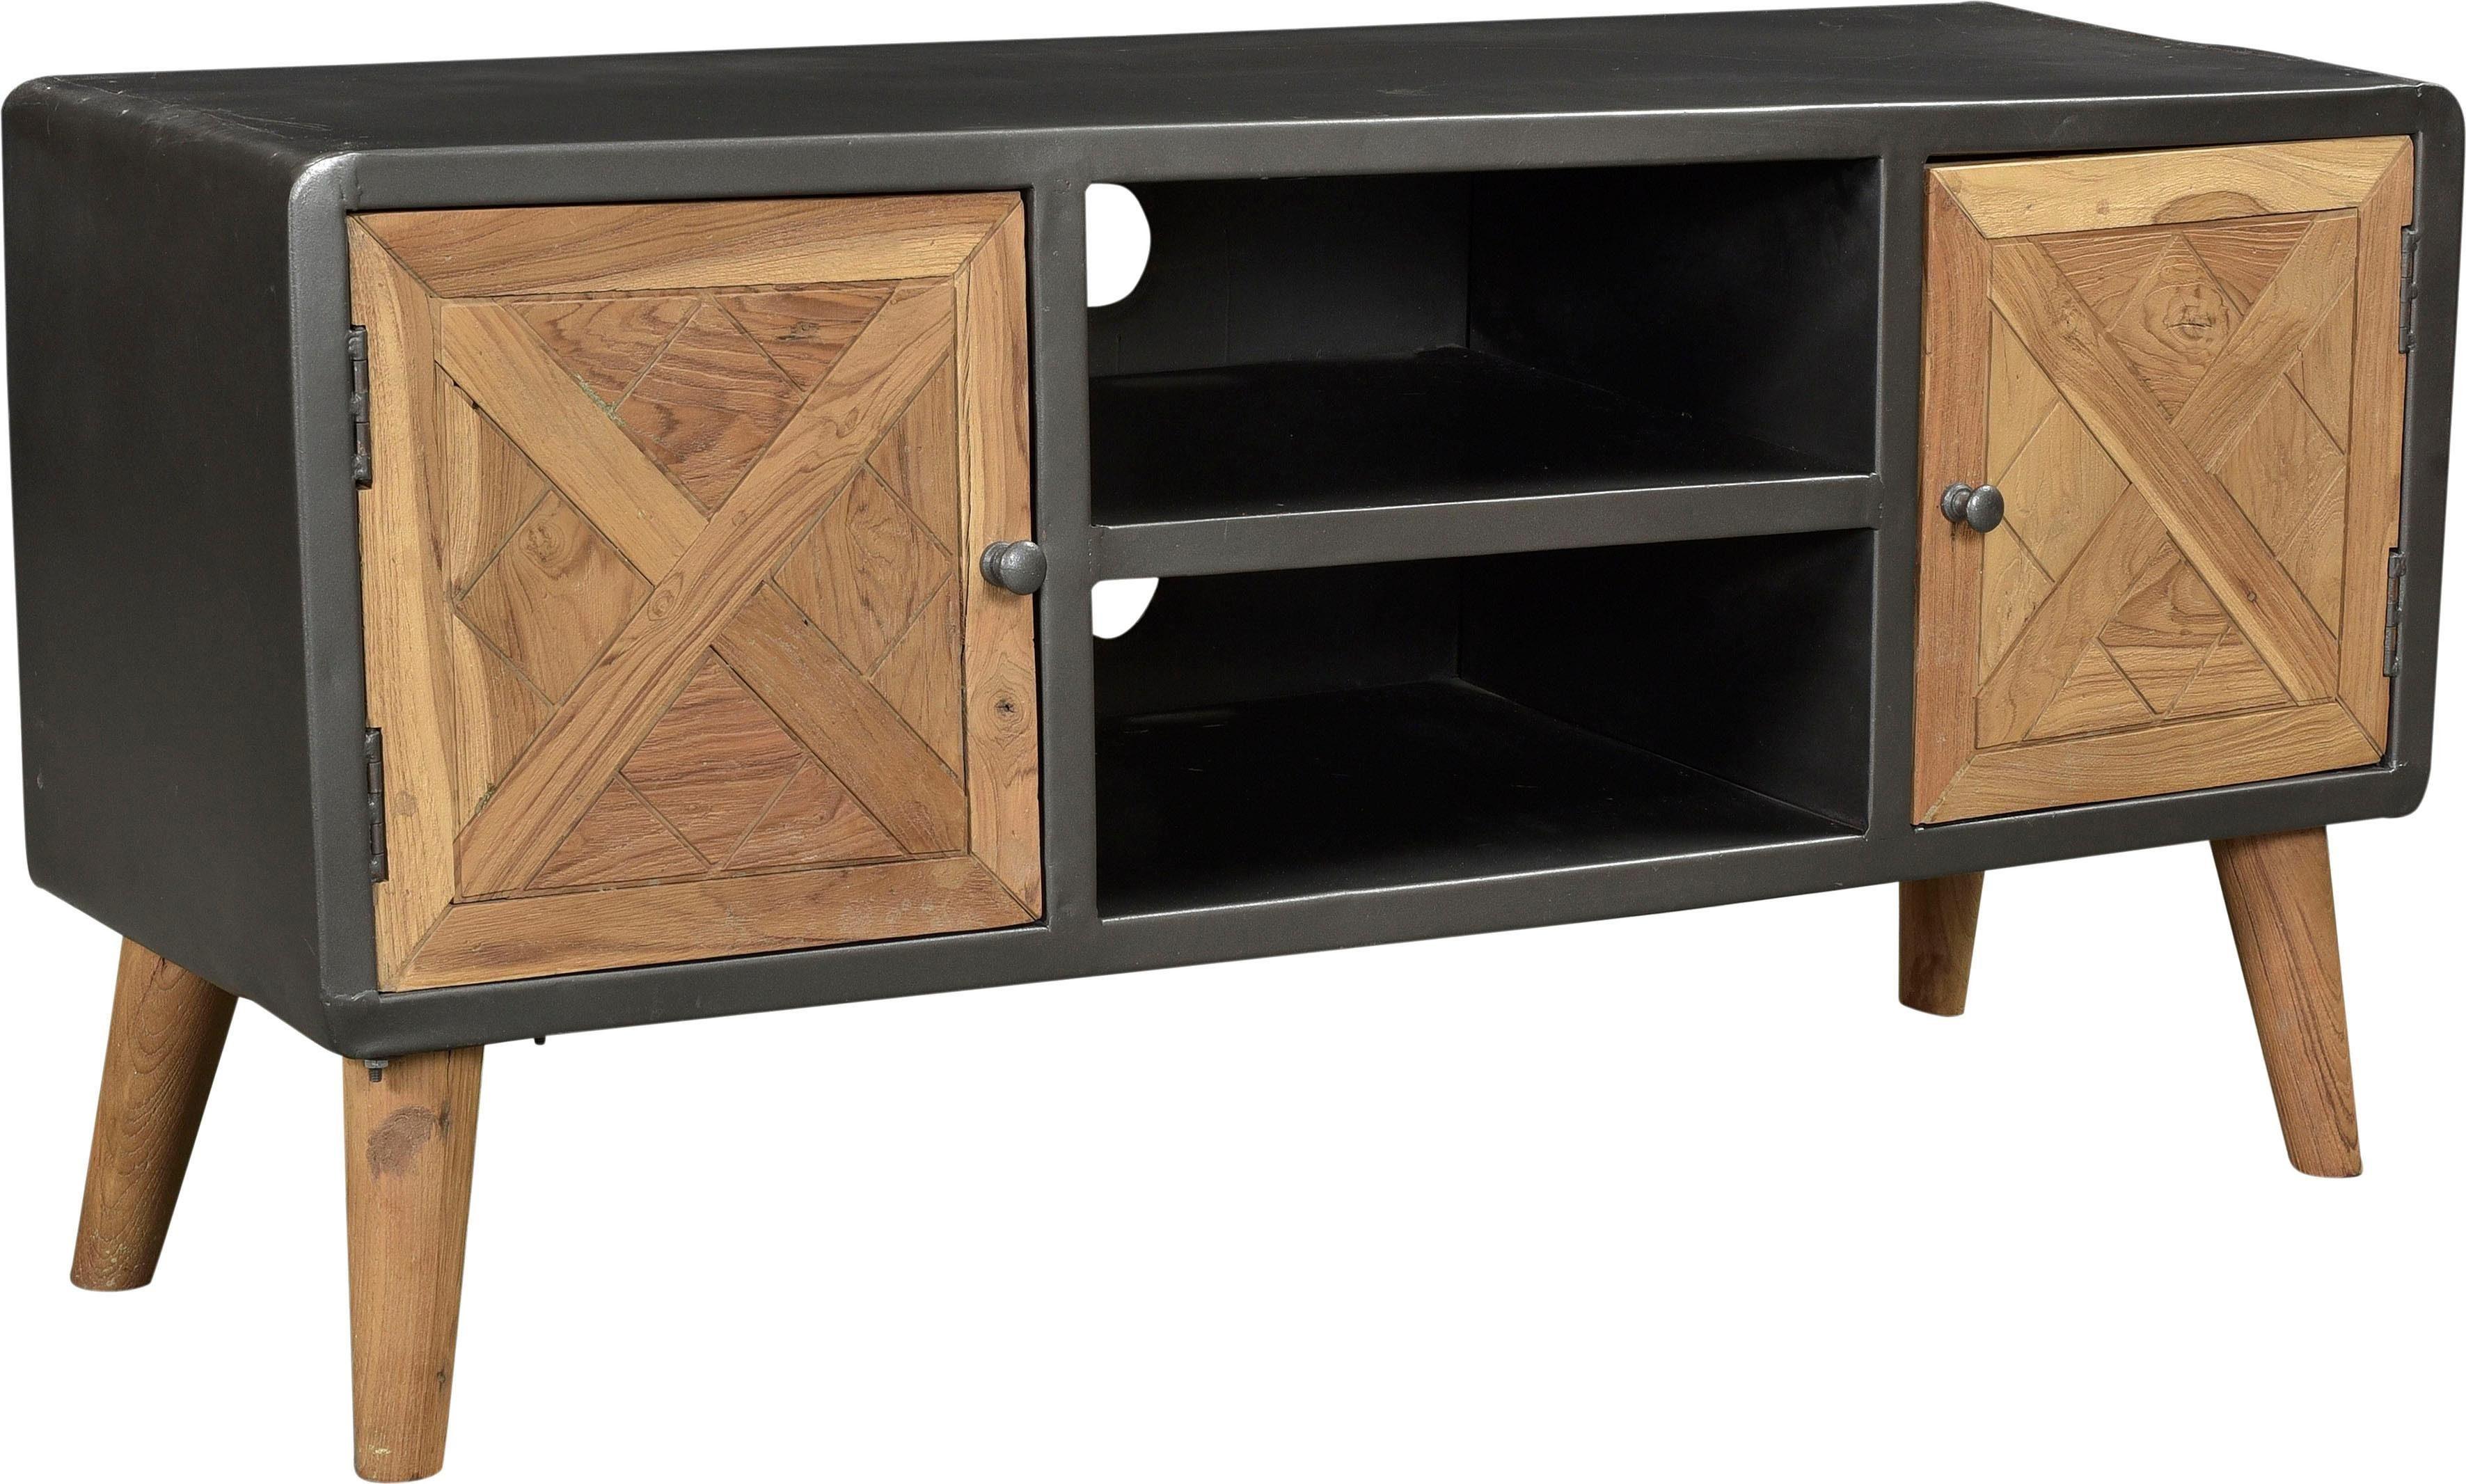 SIT Lowboard »CROSS« aus recyceltem Teakholz, Breite 123 cm